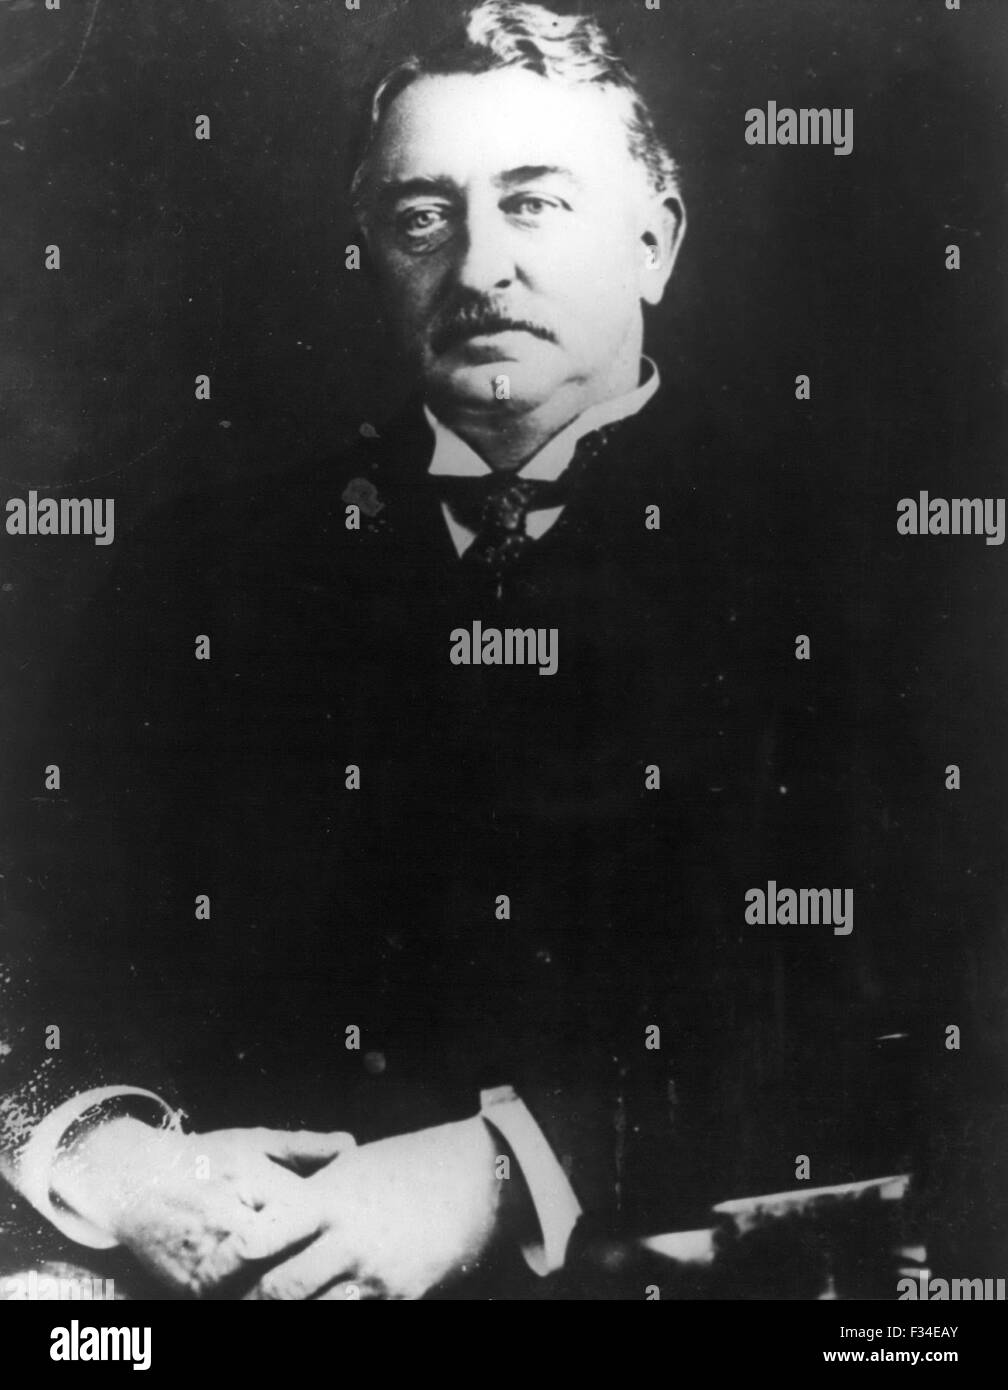 Dec. 20, 1946 - Cecil John Rhodes founder of the diamond company De Beers © Keystone Pictures USA/ZUMAPRESS.com/Alamy - Stock Image